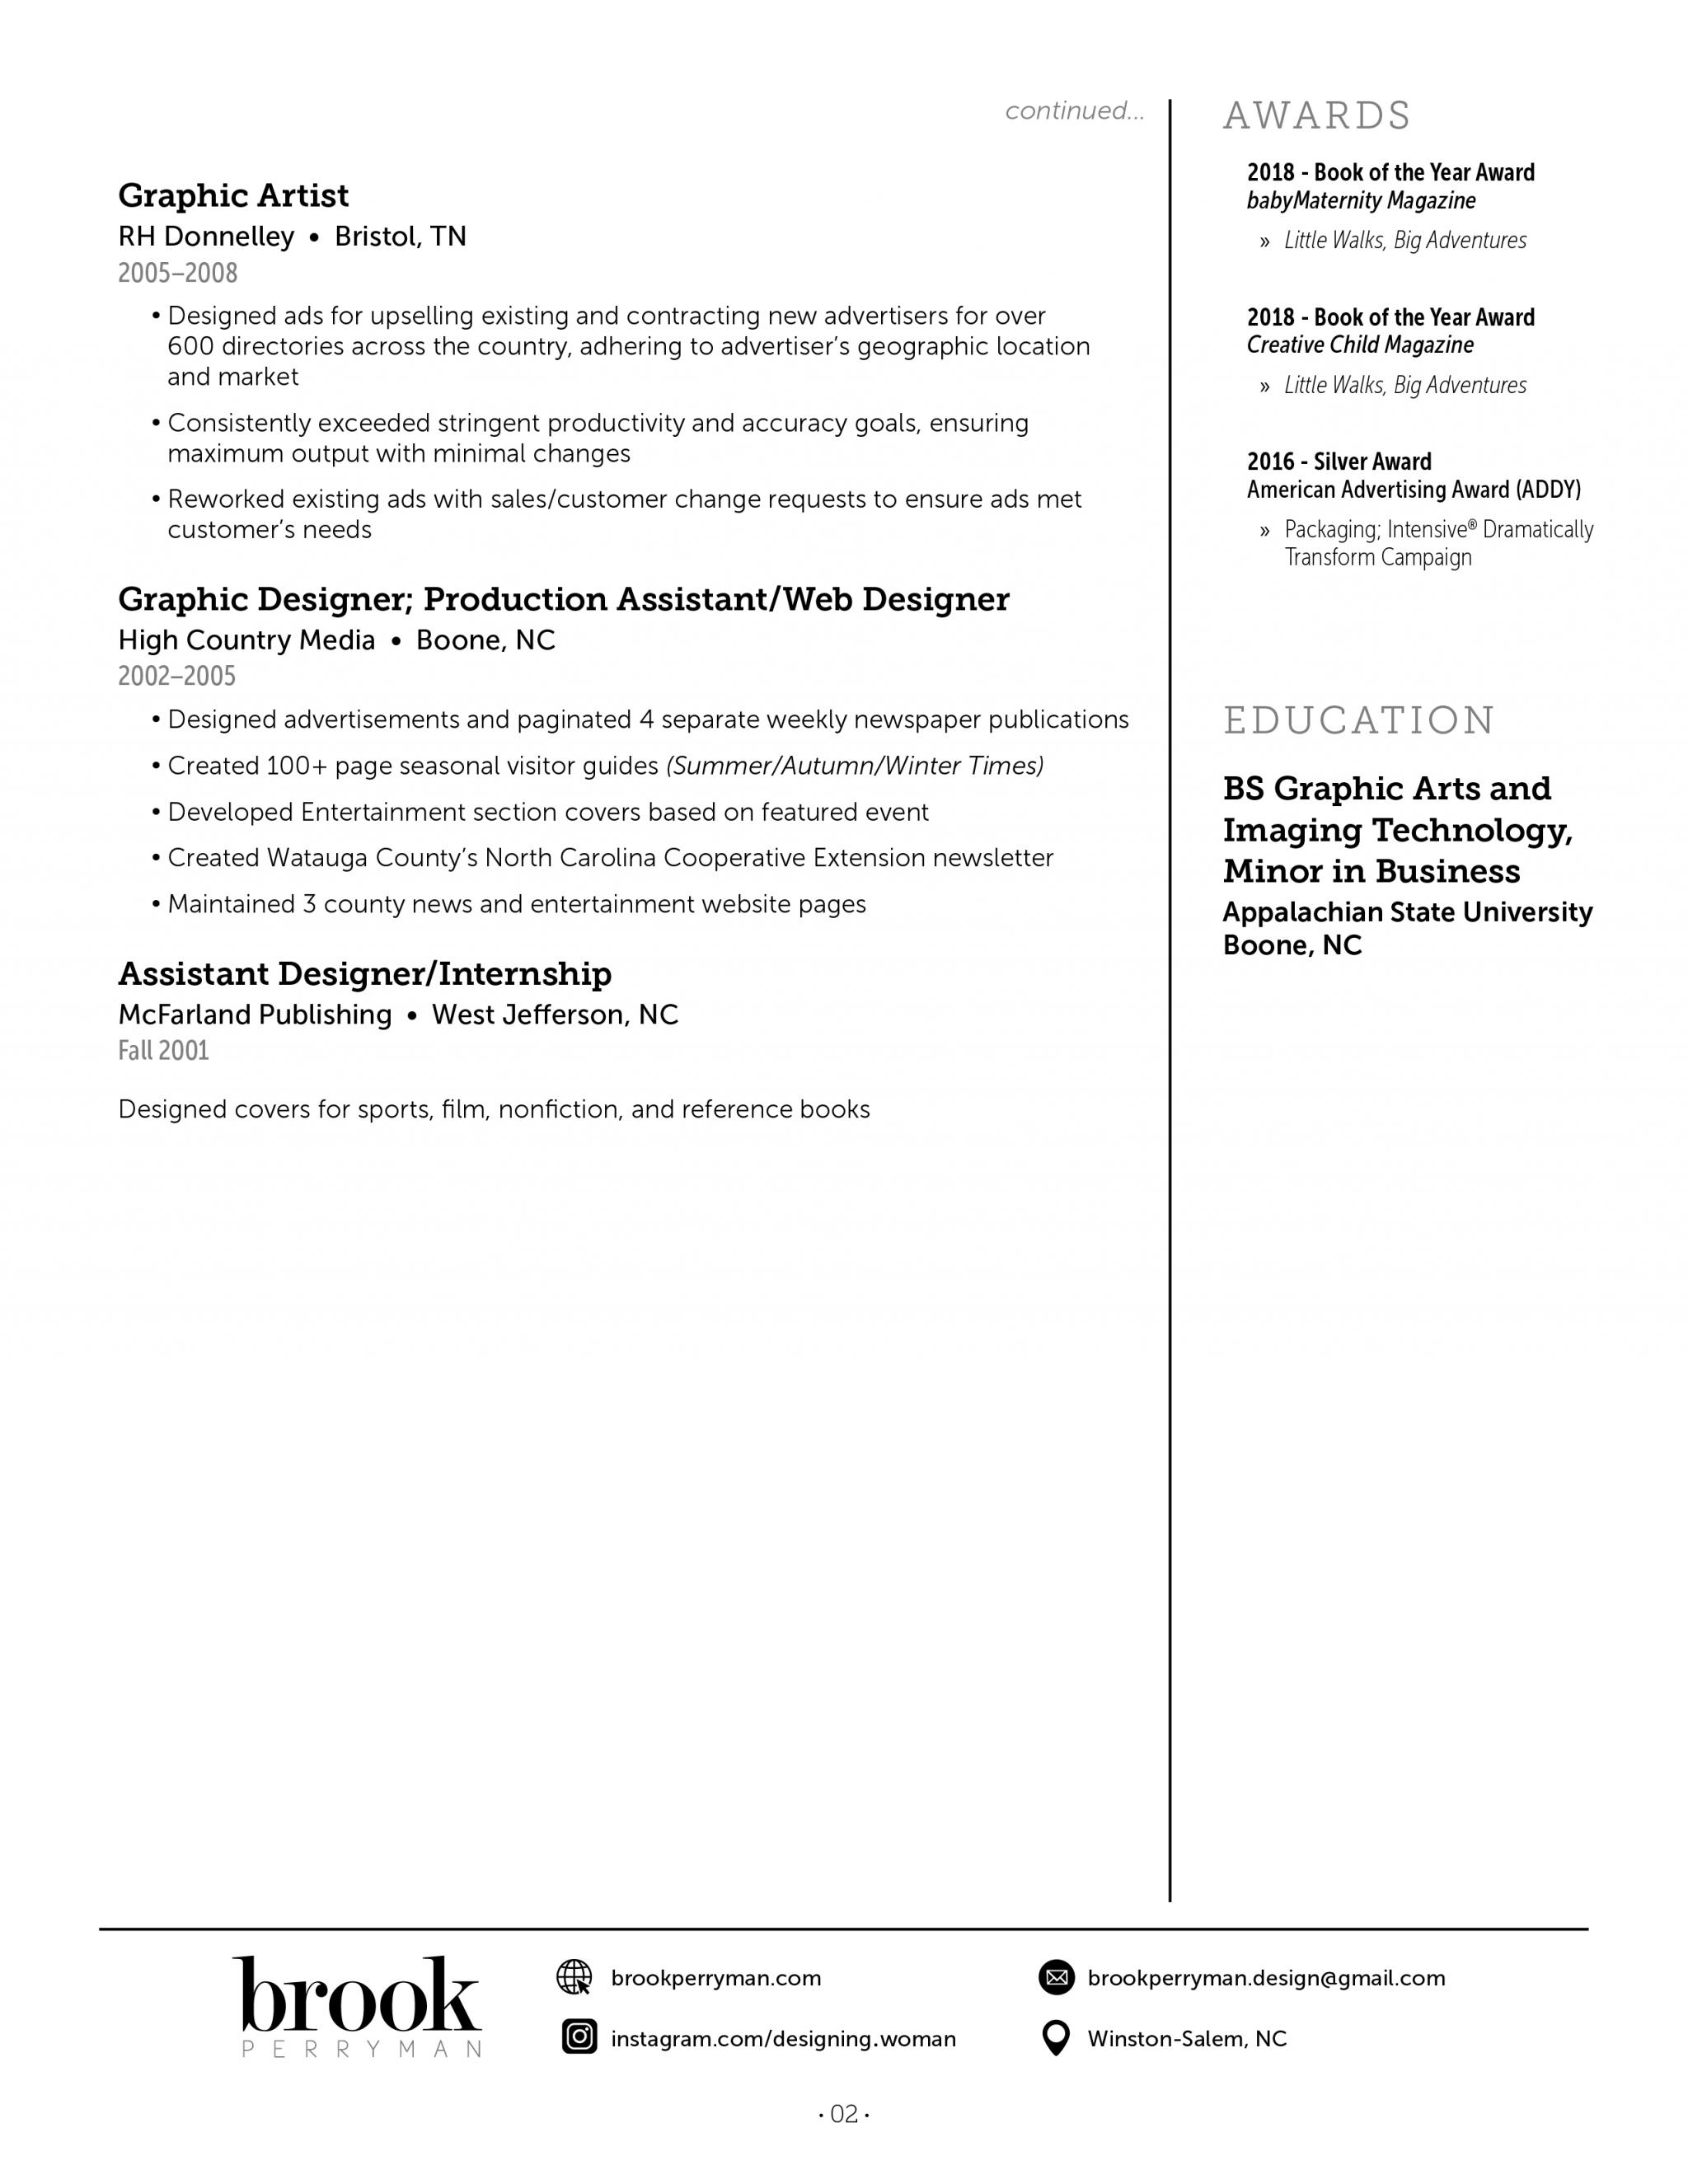 Brook Perryman downloadable resume PDF